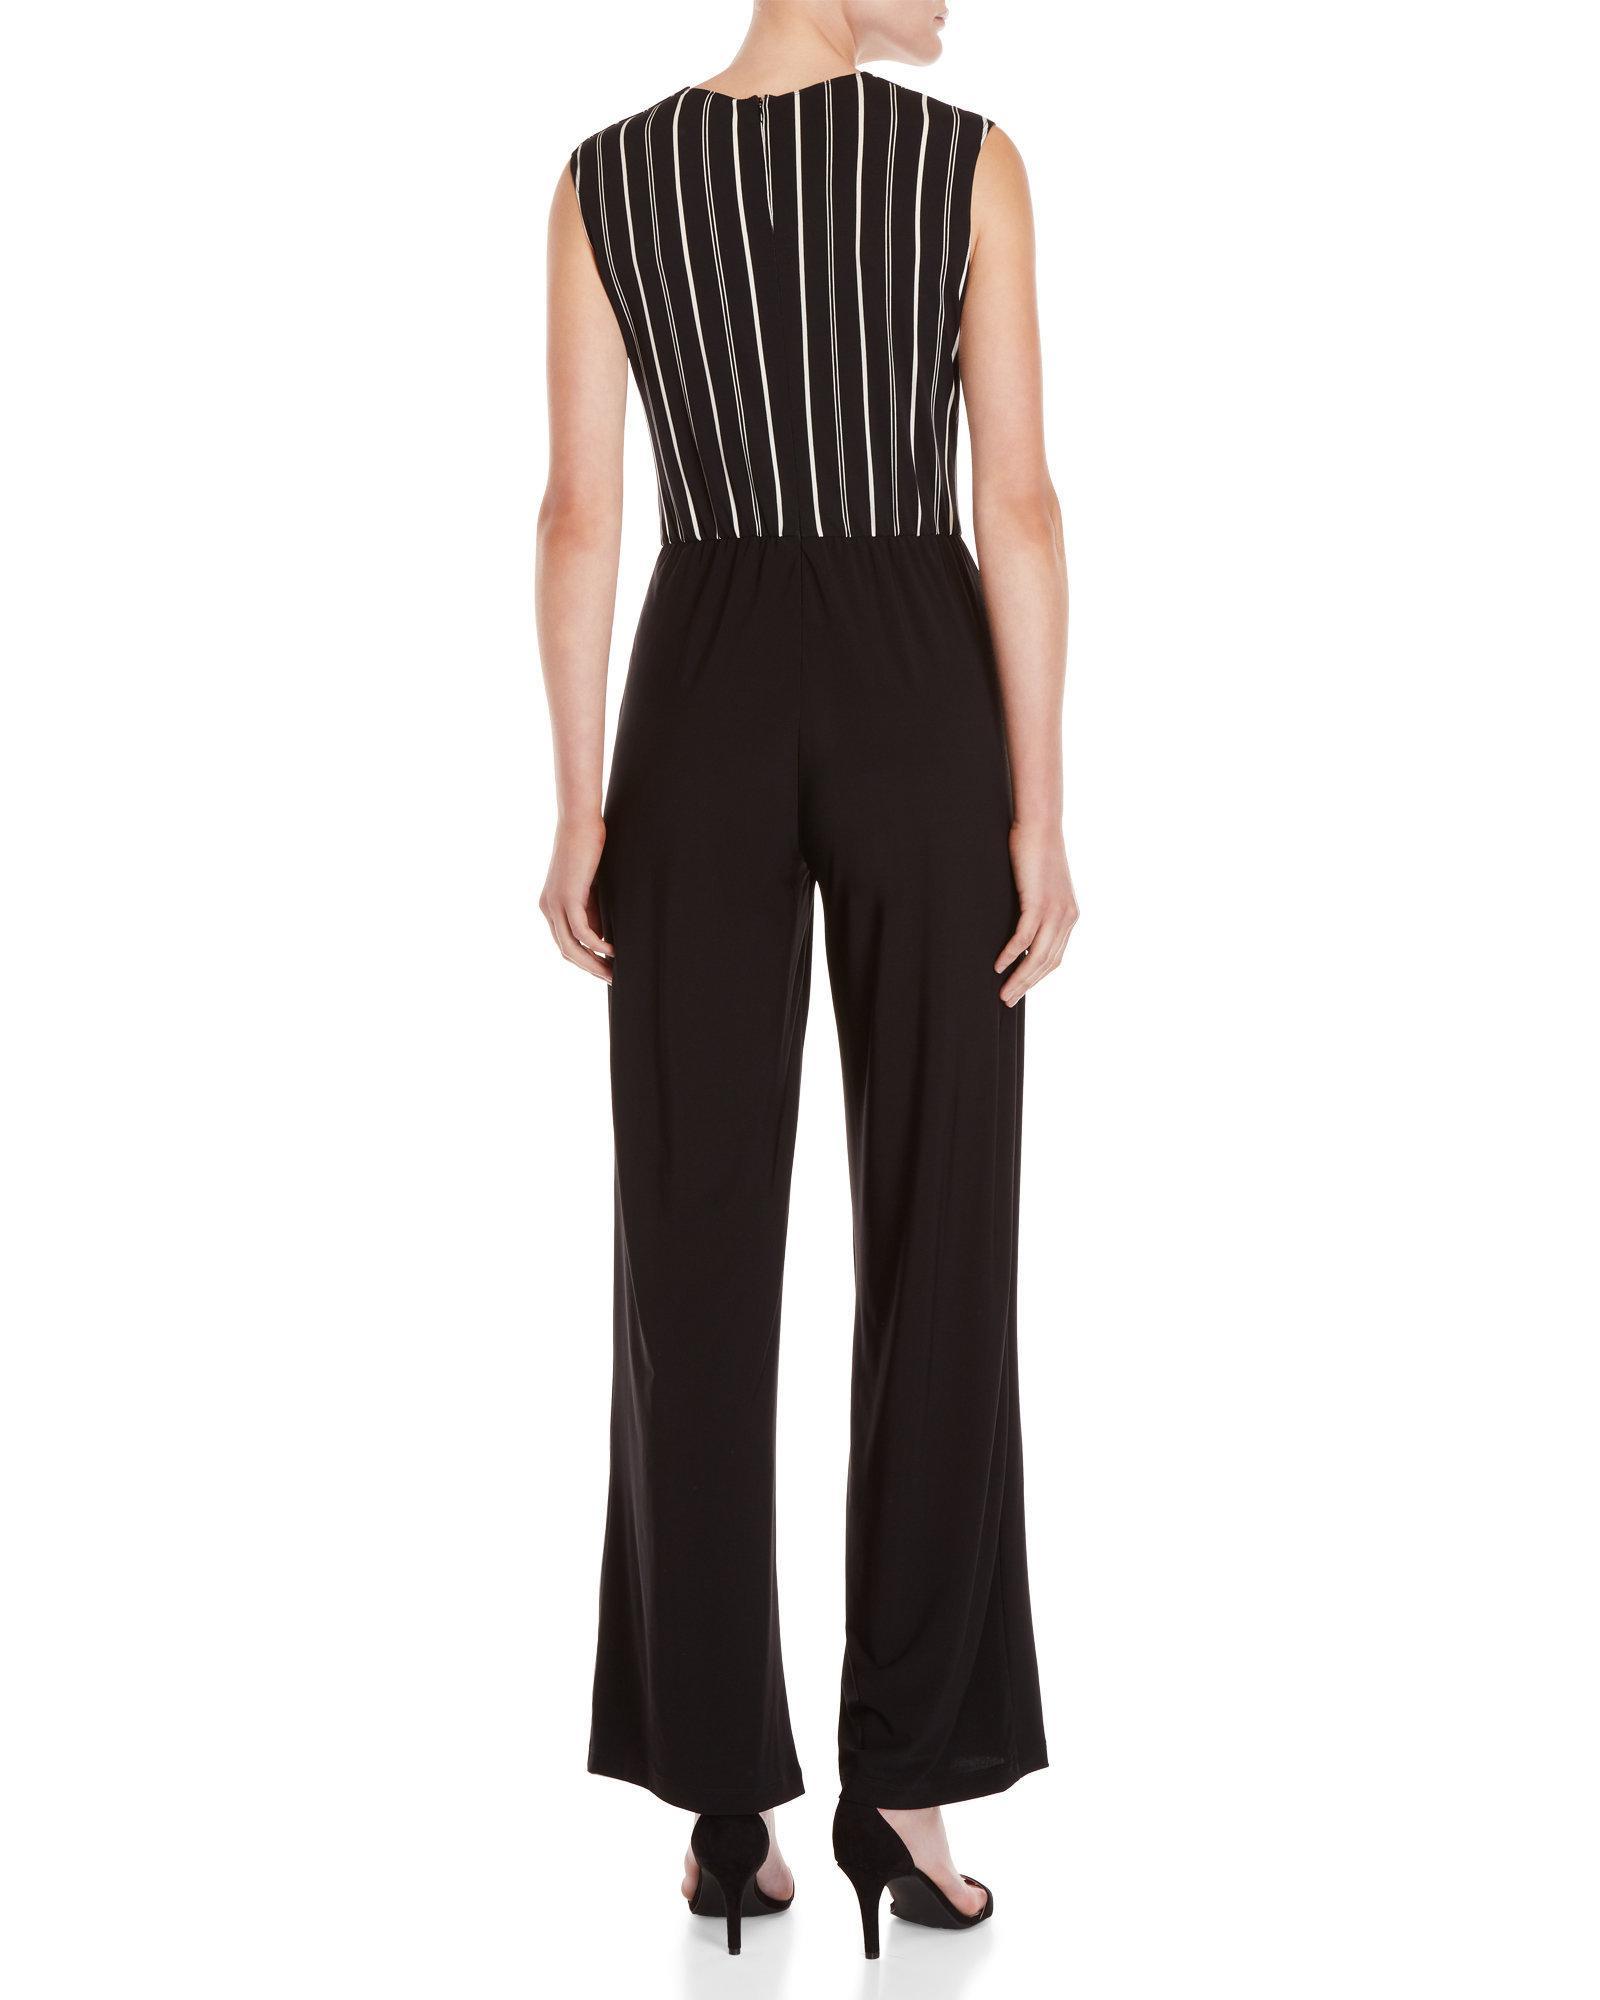 c8a2ef18cdb3 Lyst - Bebe Pinstripe Bodice Jumpsuit in Black